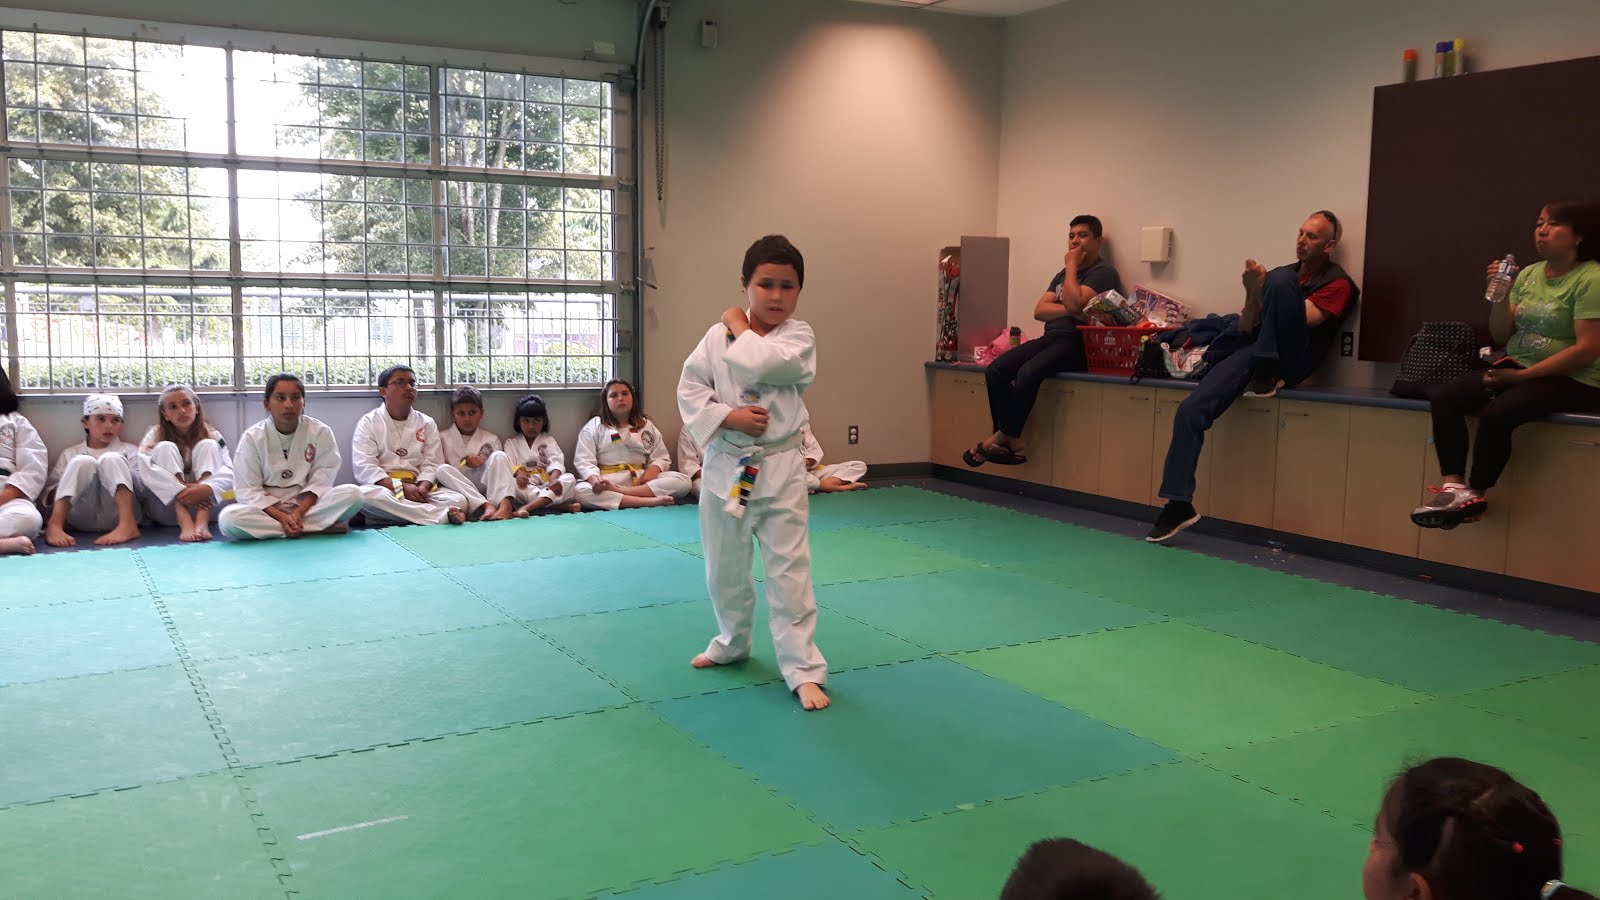 Tae Kwon Do test